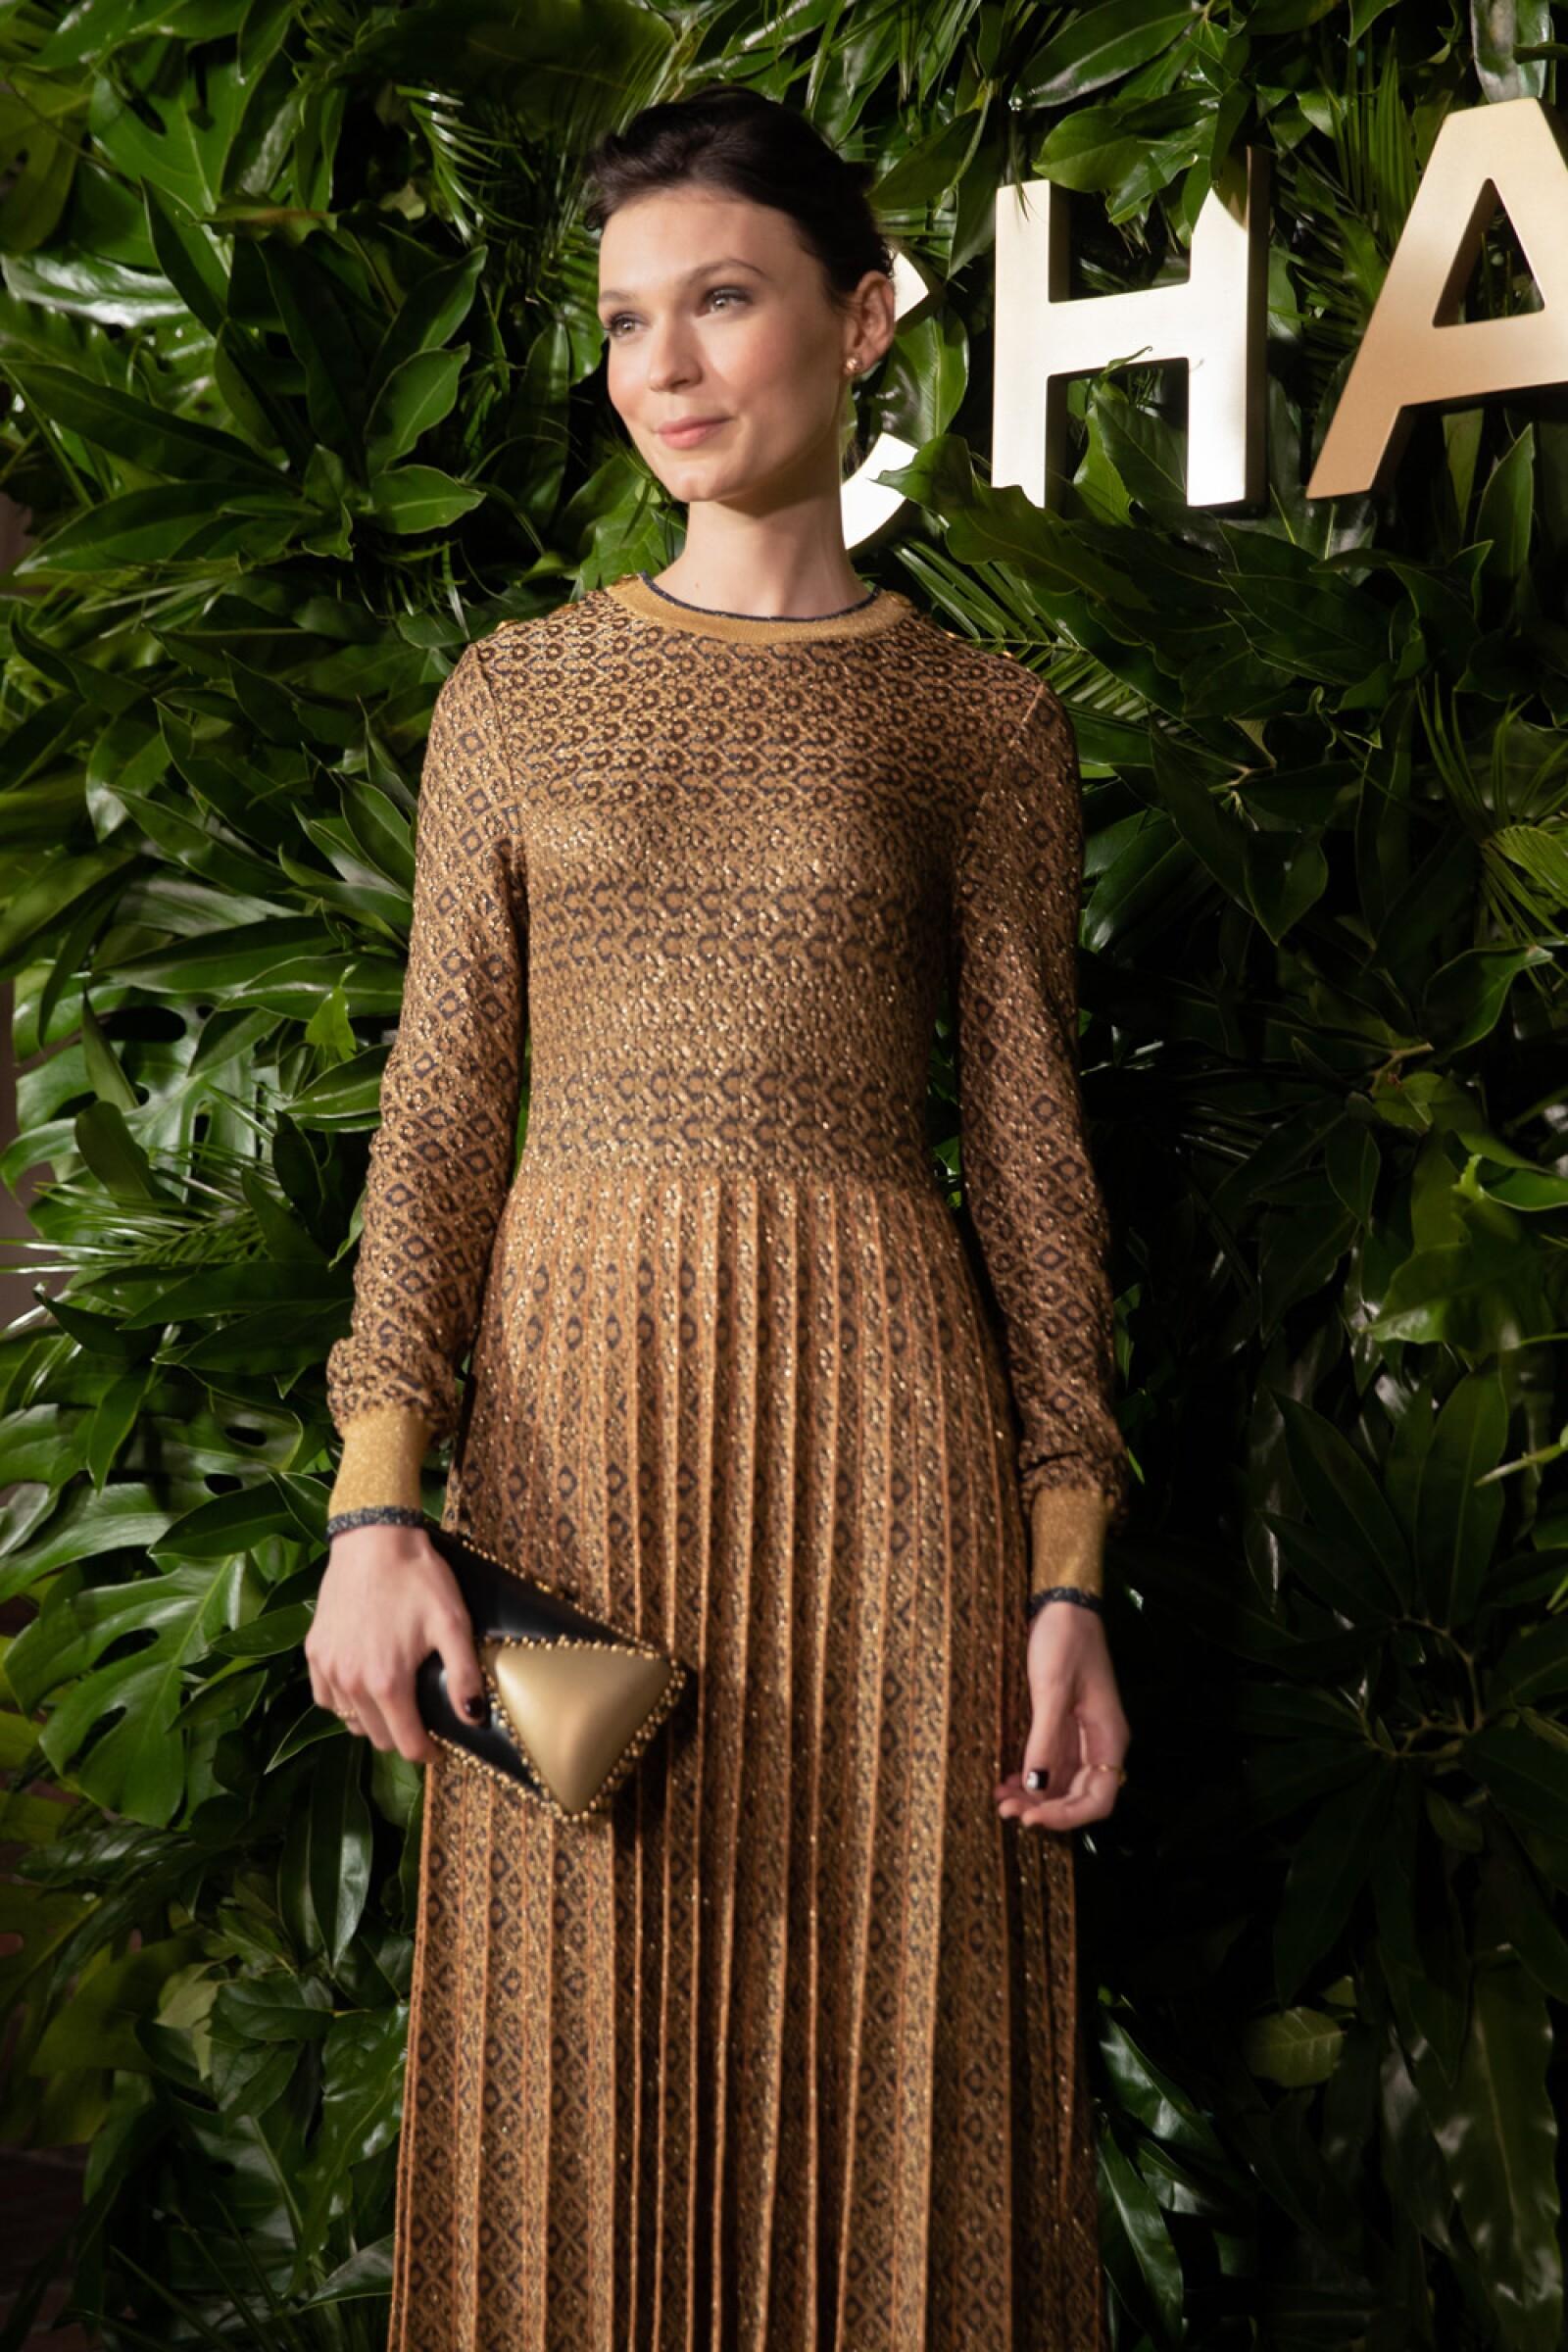 Tilda Cobham-HERVEY_Gabrielle CHANEL Essence_Dinner_Hosted by Margot ROBBIE_September_12th_2 (2).jpg